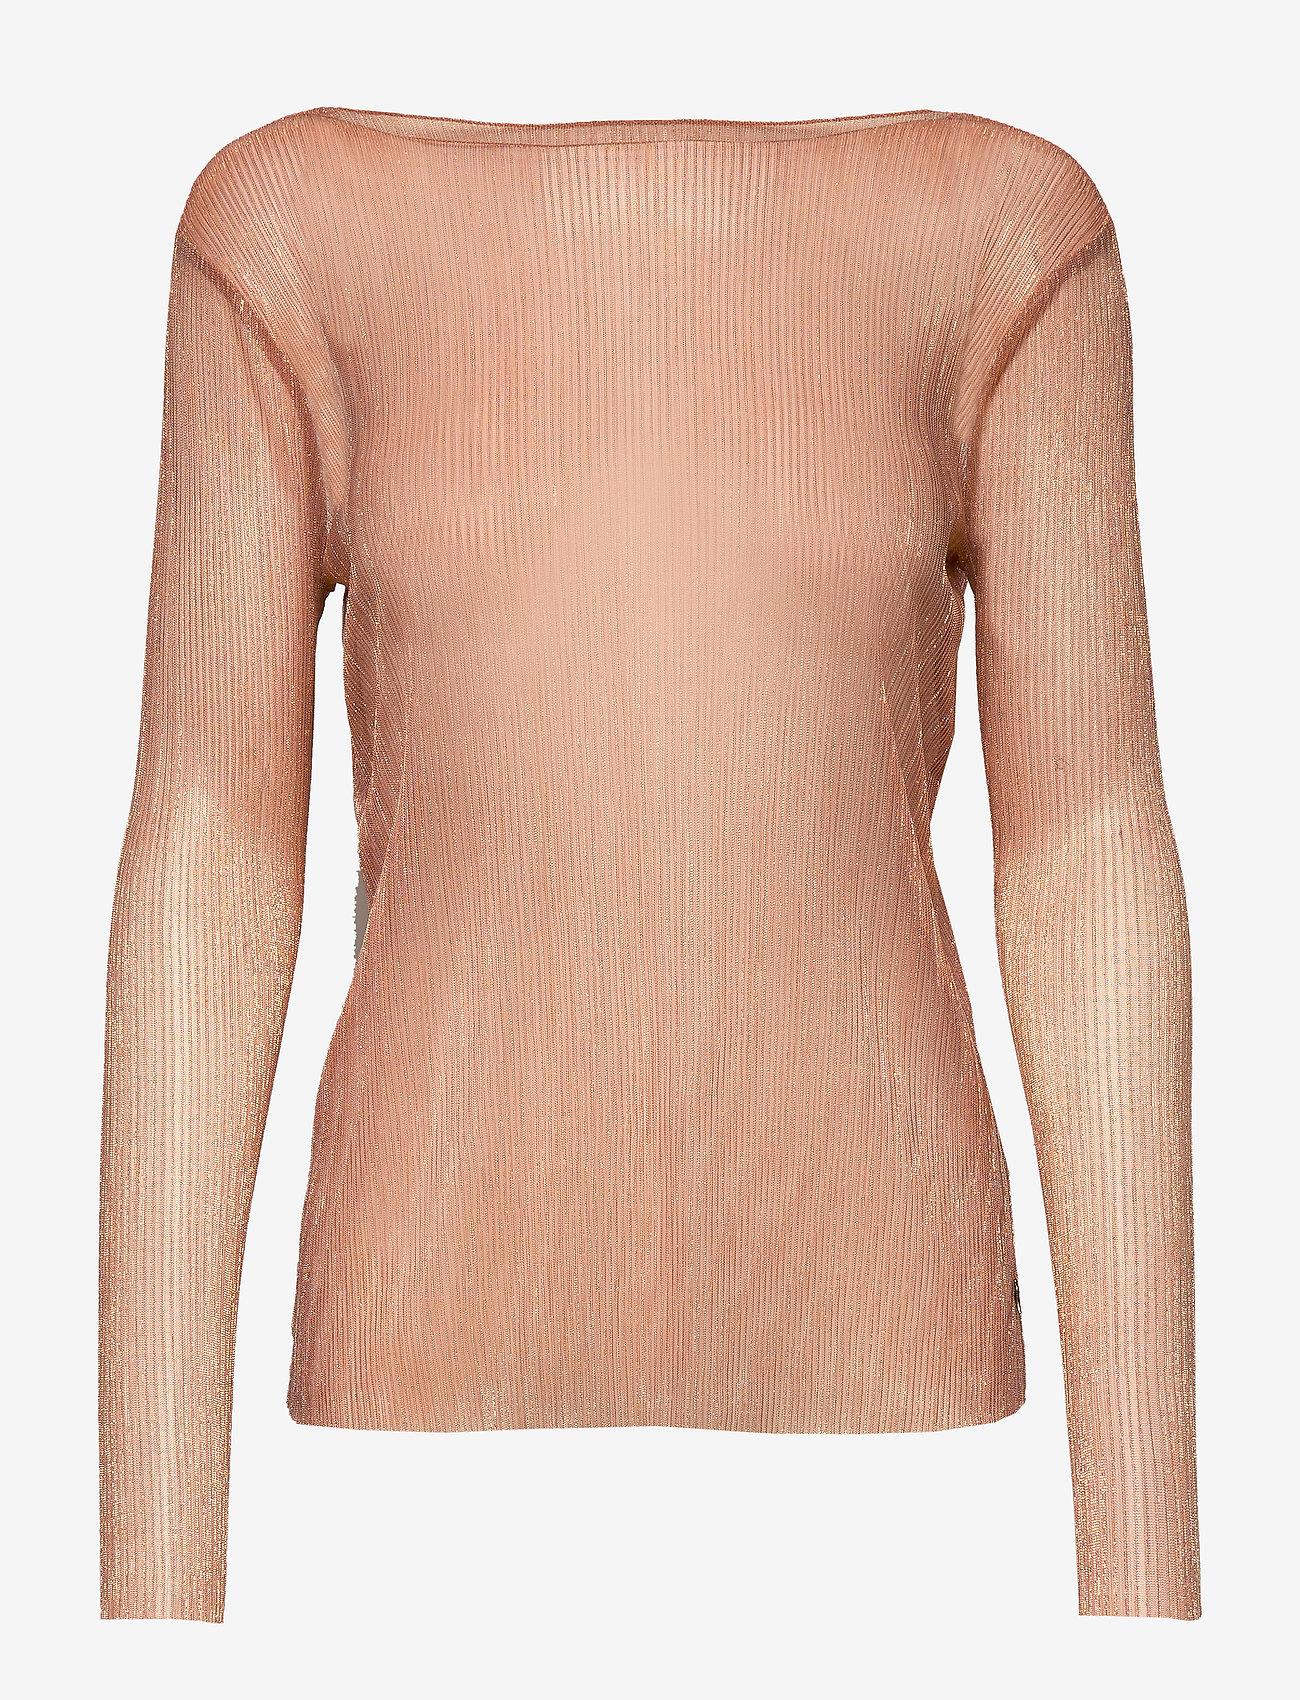 Coster Copenhagen - Blouse long sleeved in lurex - blouses à manches longues - cobber